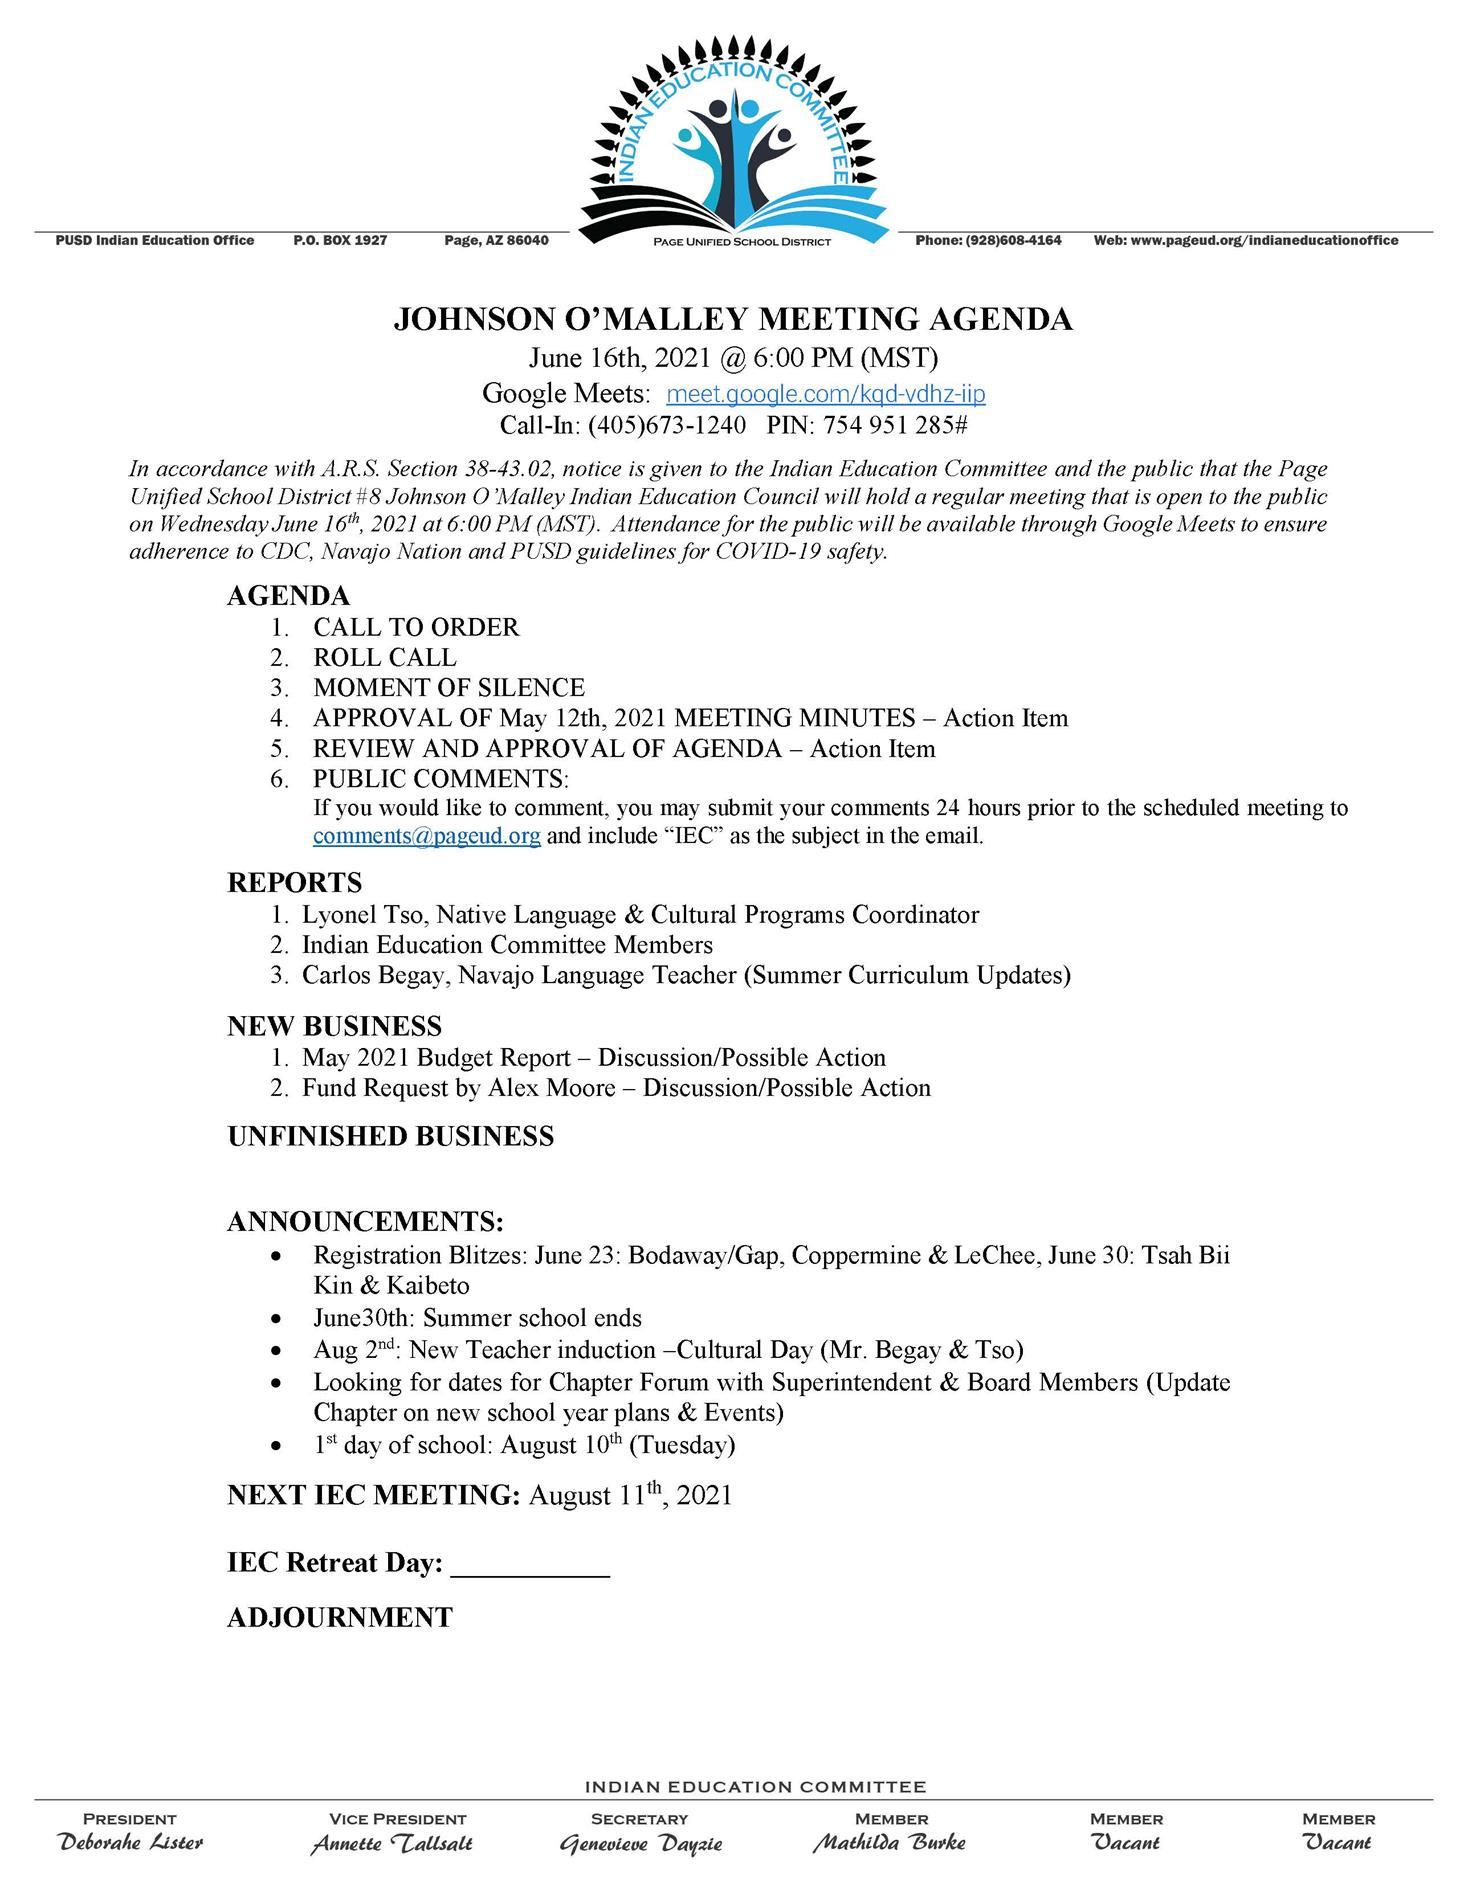 JUNE IEC Meeting Agenda